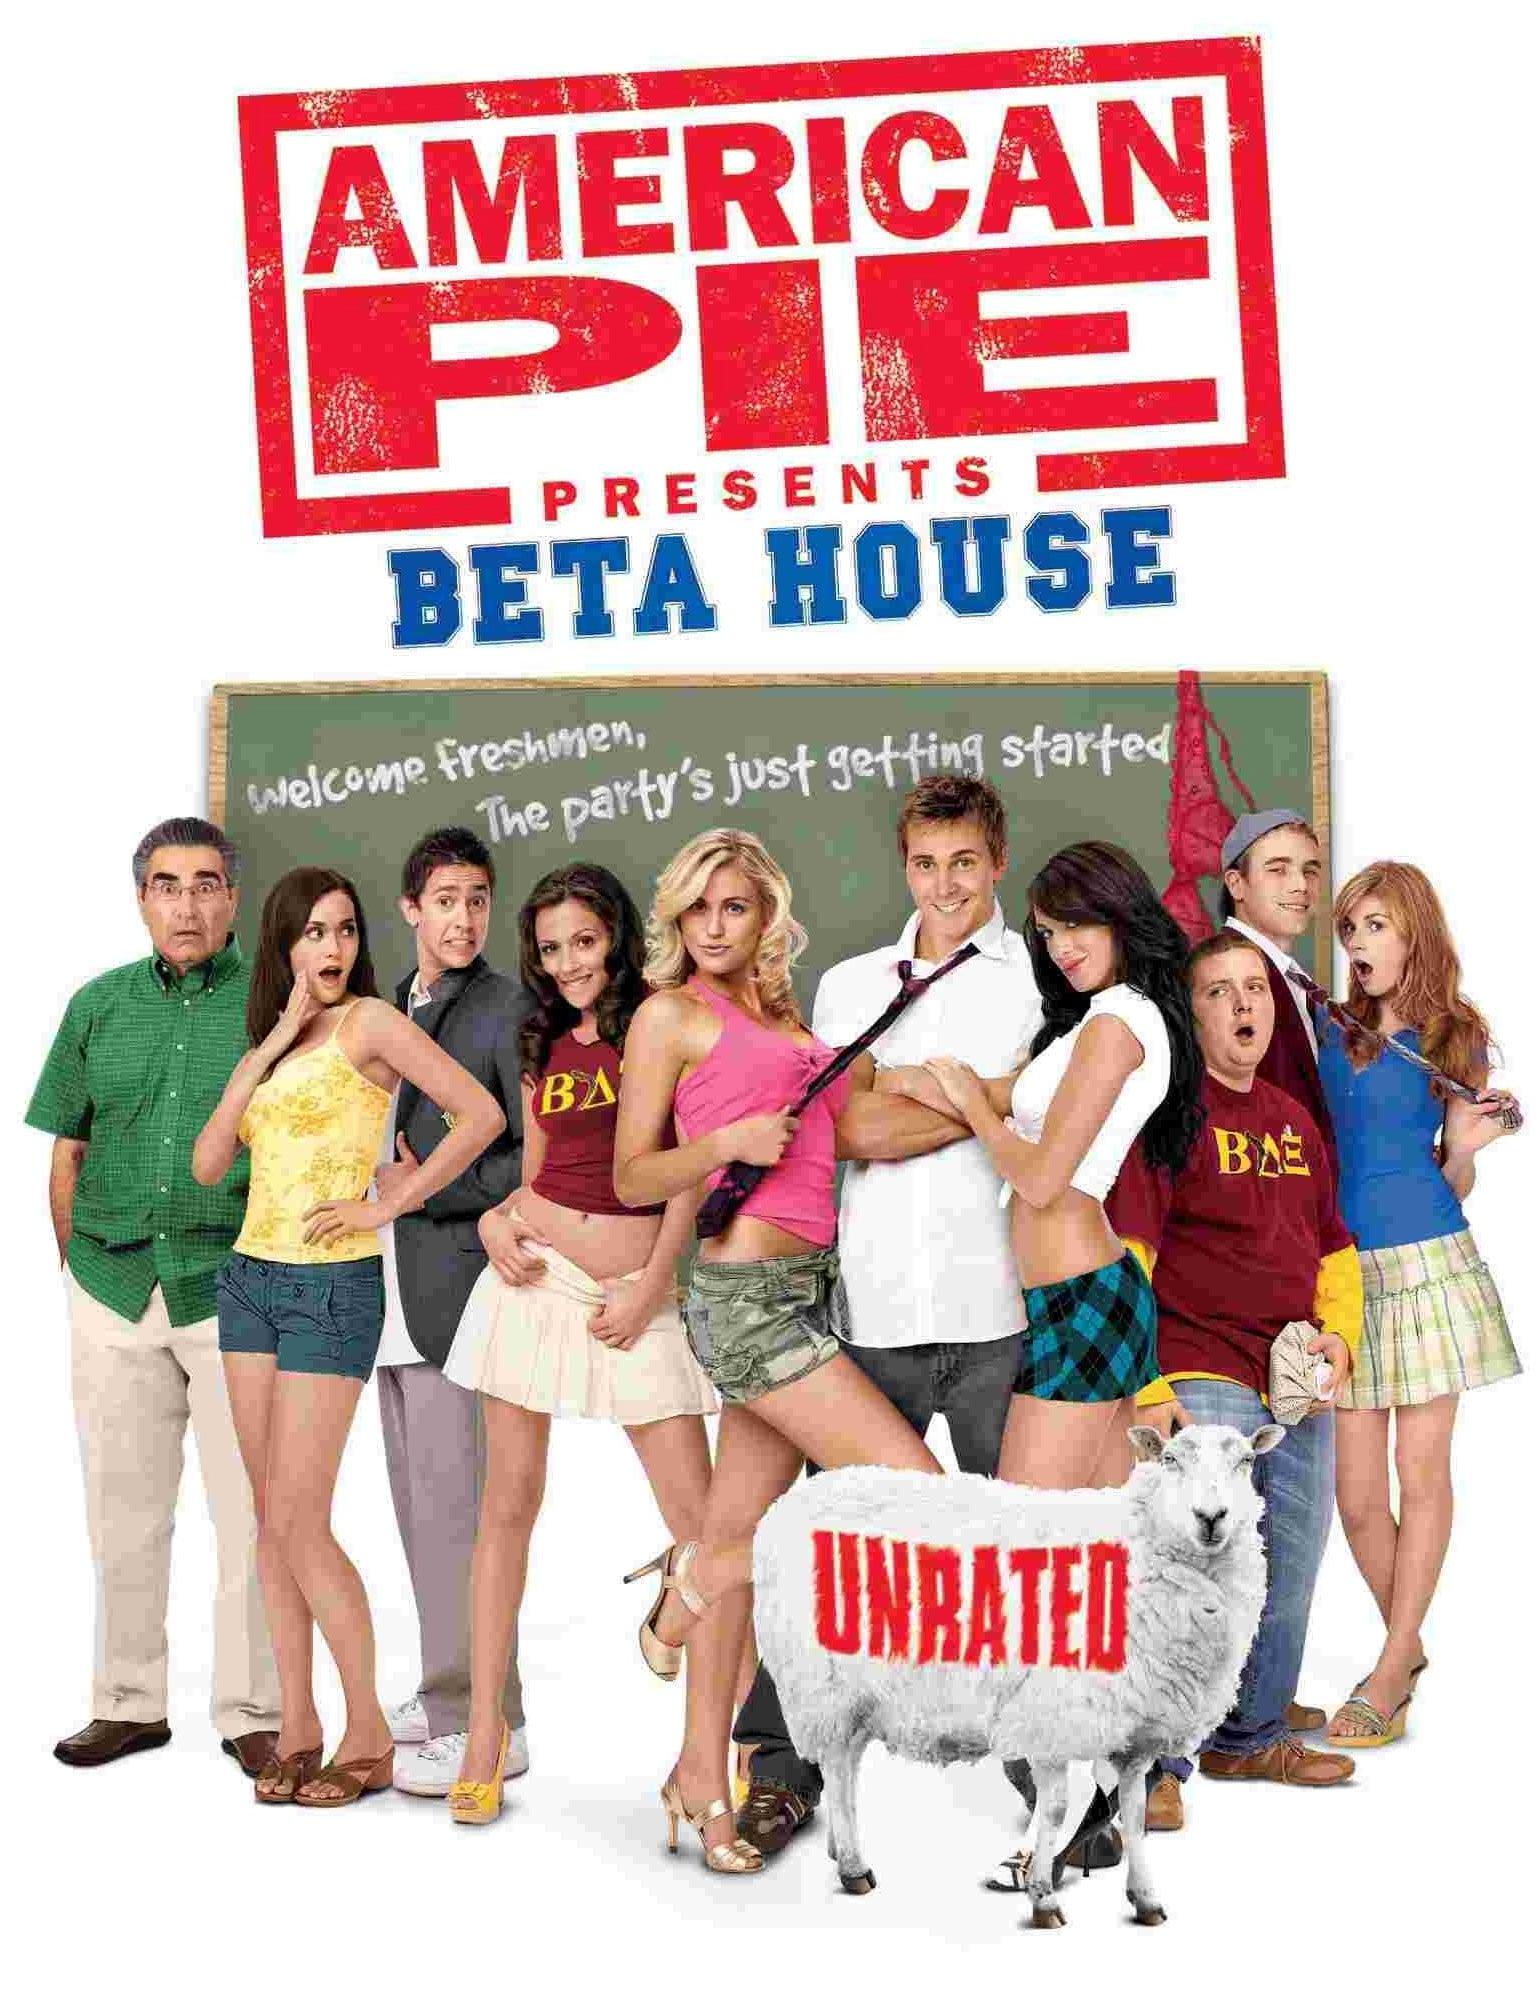 Смотреть онлайн Американский пирог 1  American Pie 1